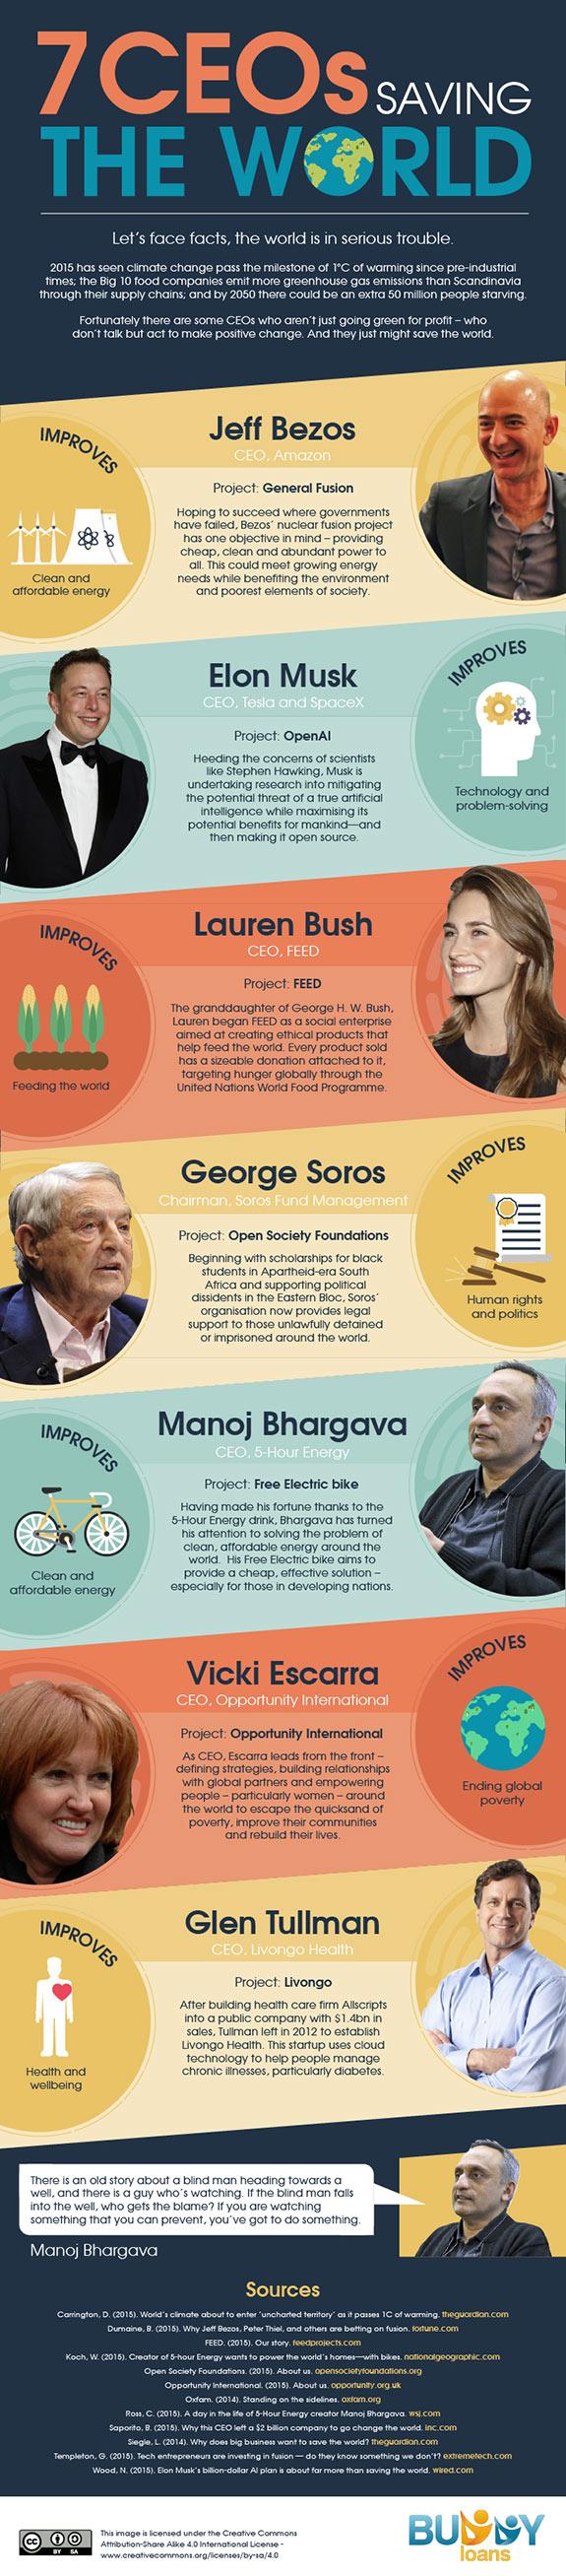 7-CEOs-saving-the-world3